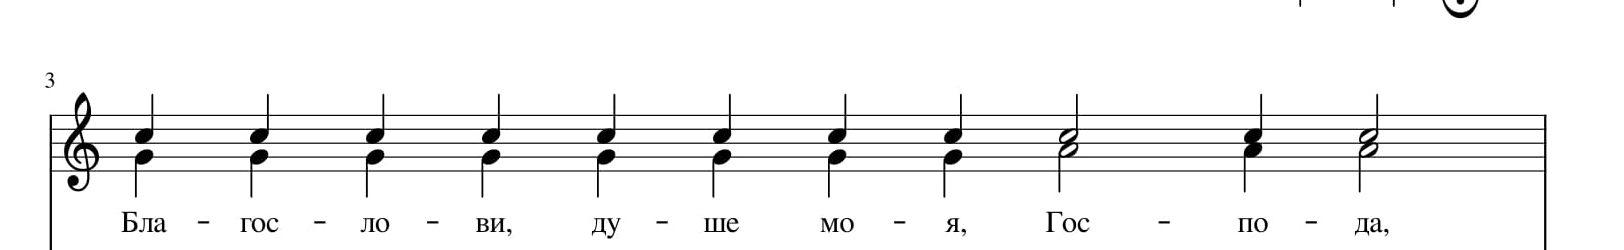 1-ый антифон Литургии Афонский напев